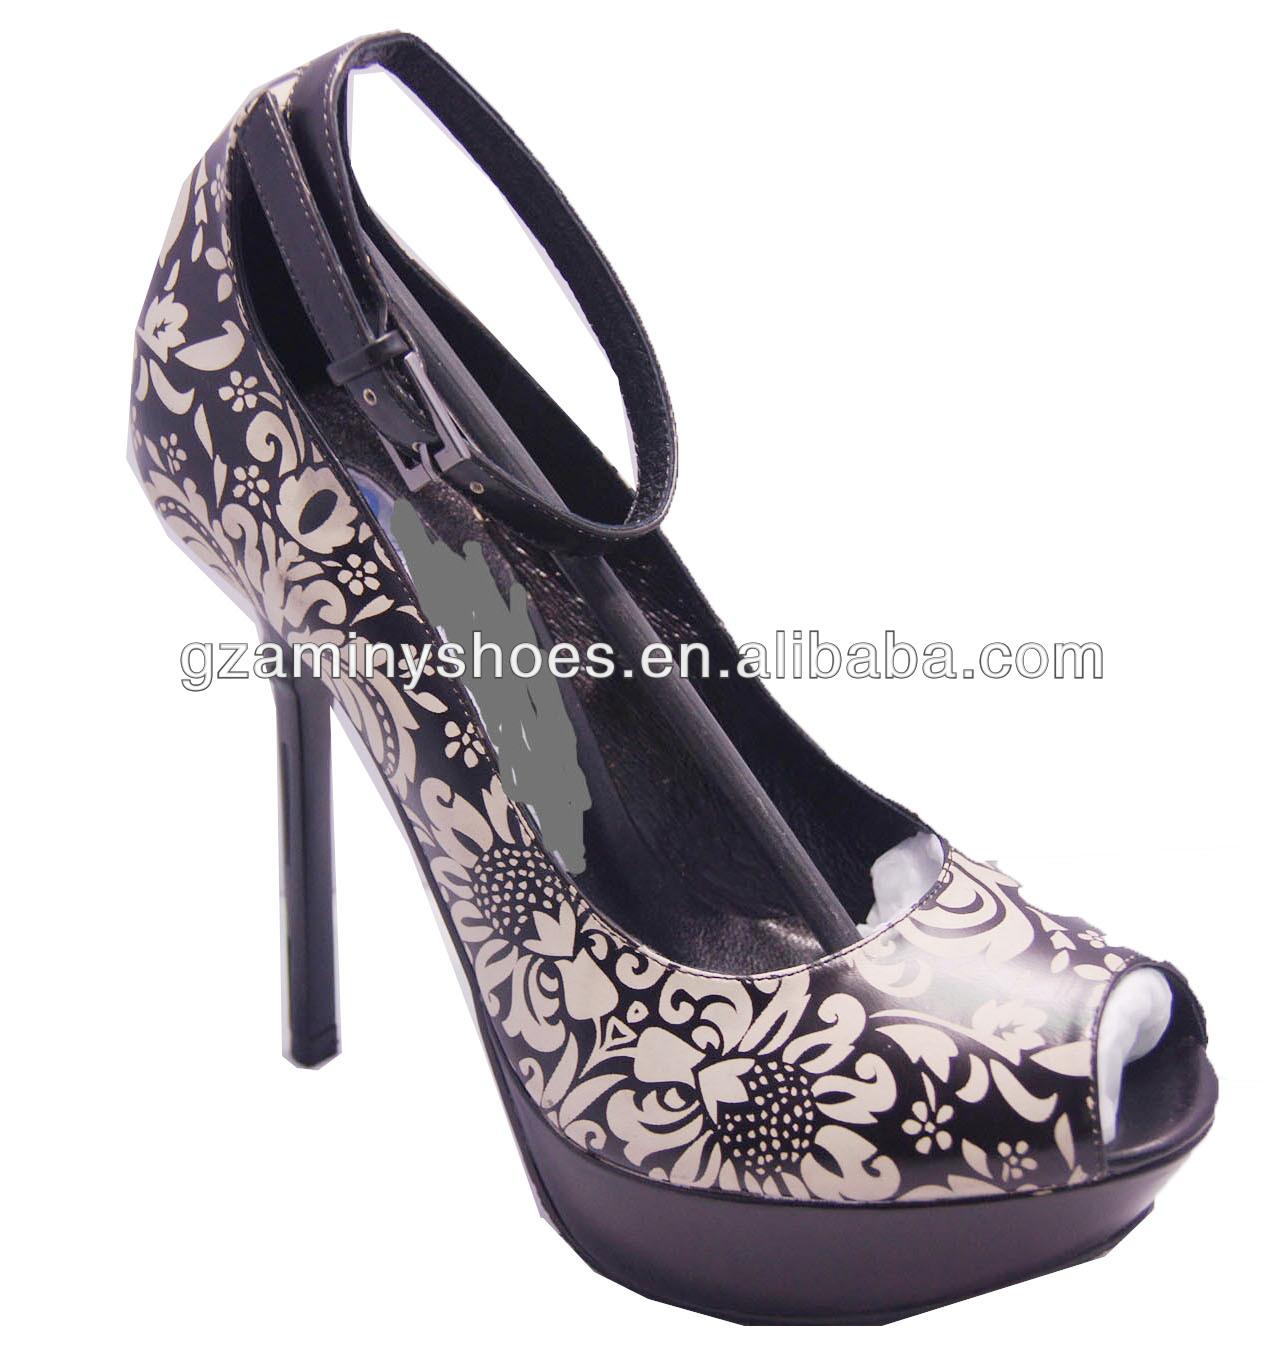 platform peep toe high high heels heel Latest plus shoes gwaxqpPndC